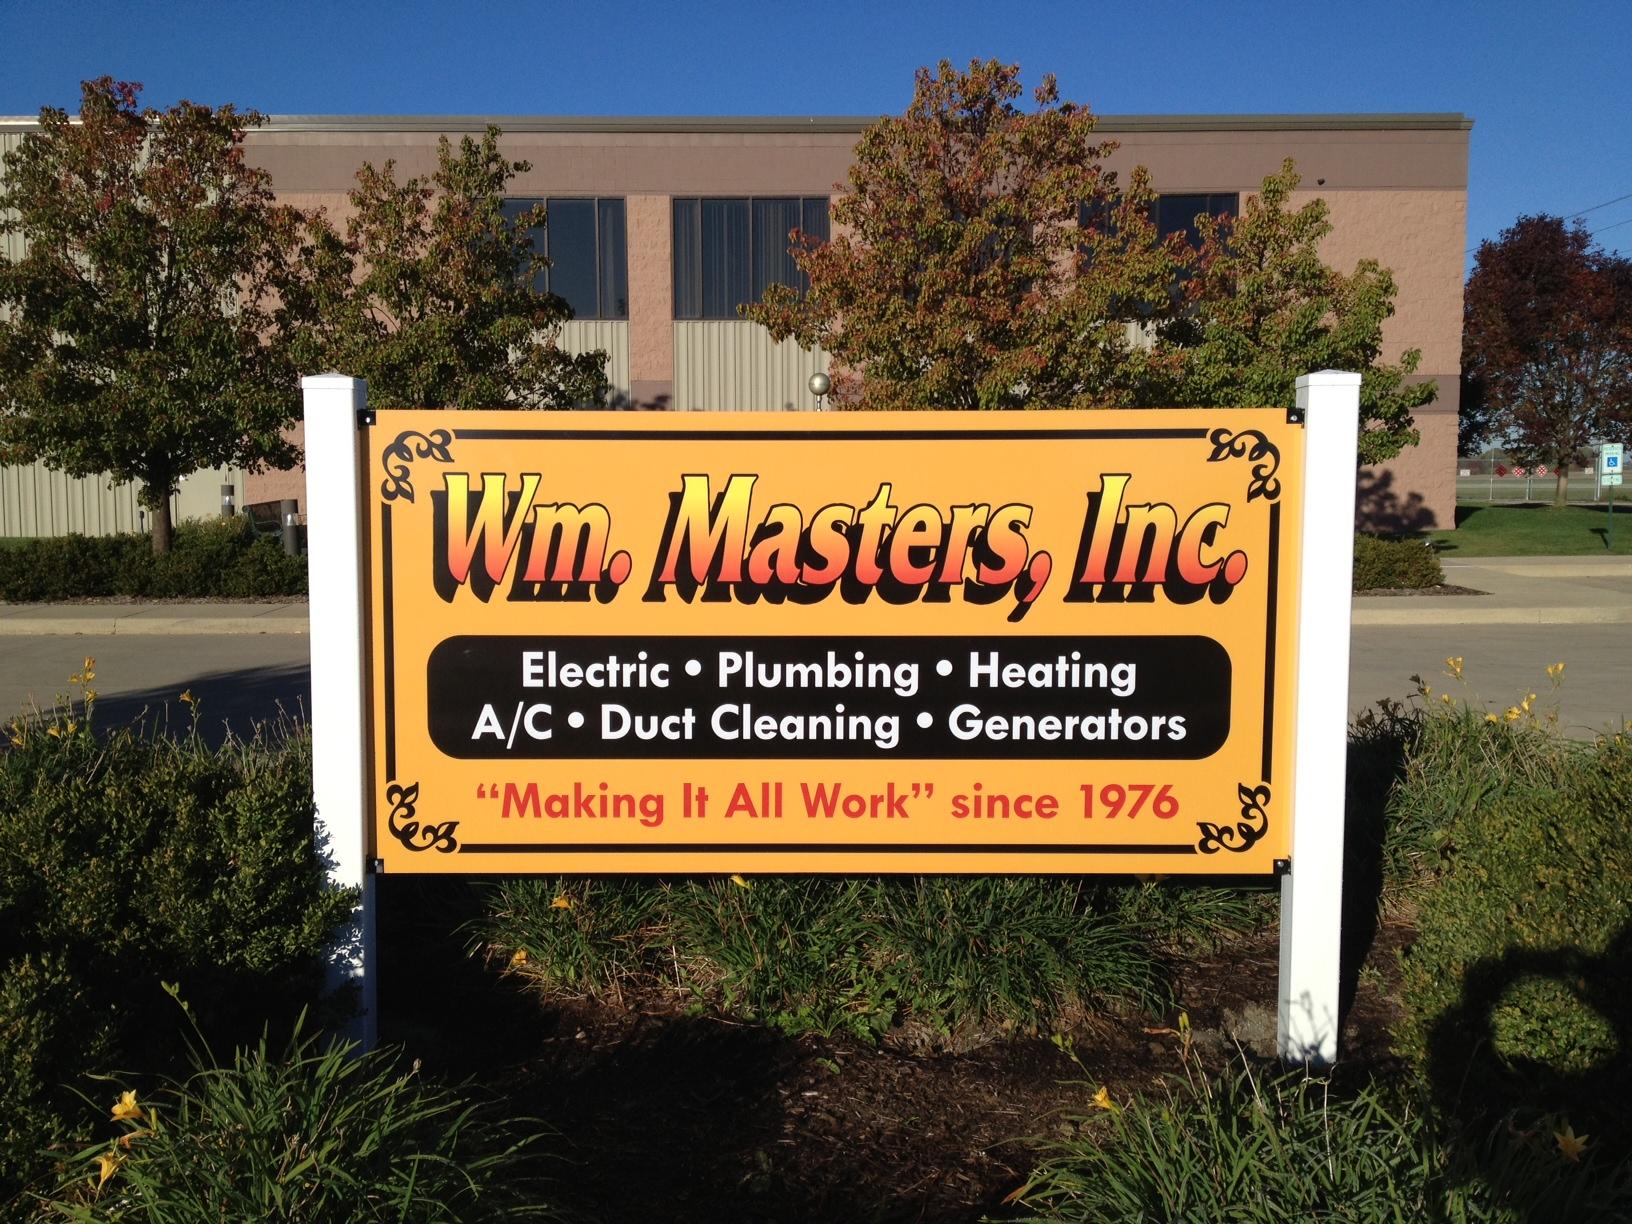 Wm. Masters, Inc image 2